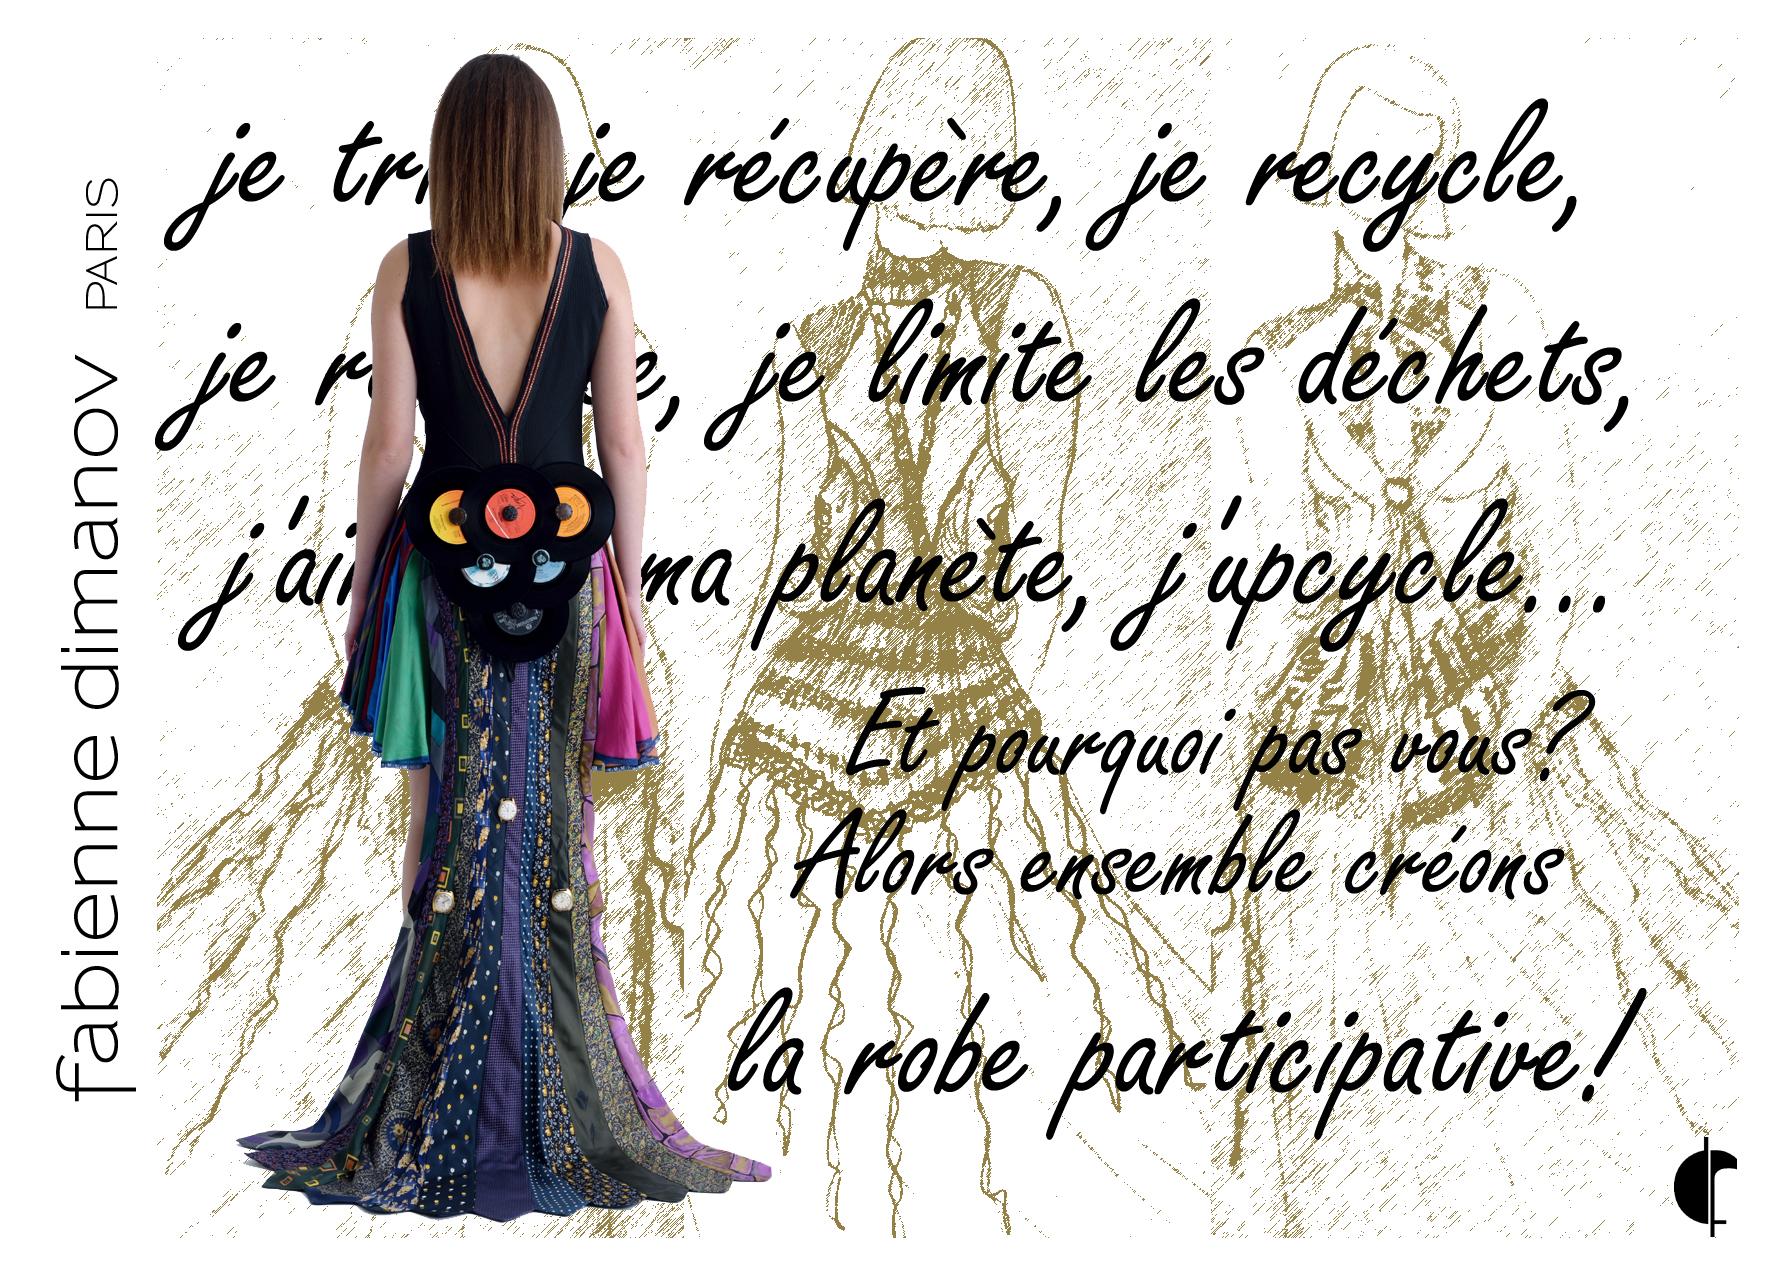 Robe participative - Fabienne Dimanov Paris